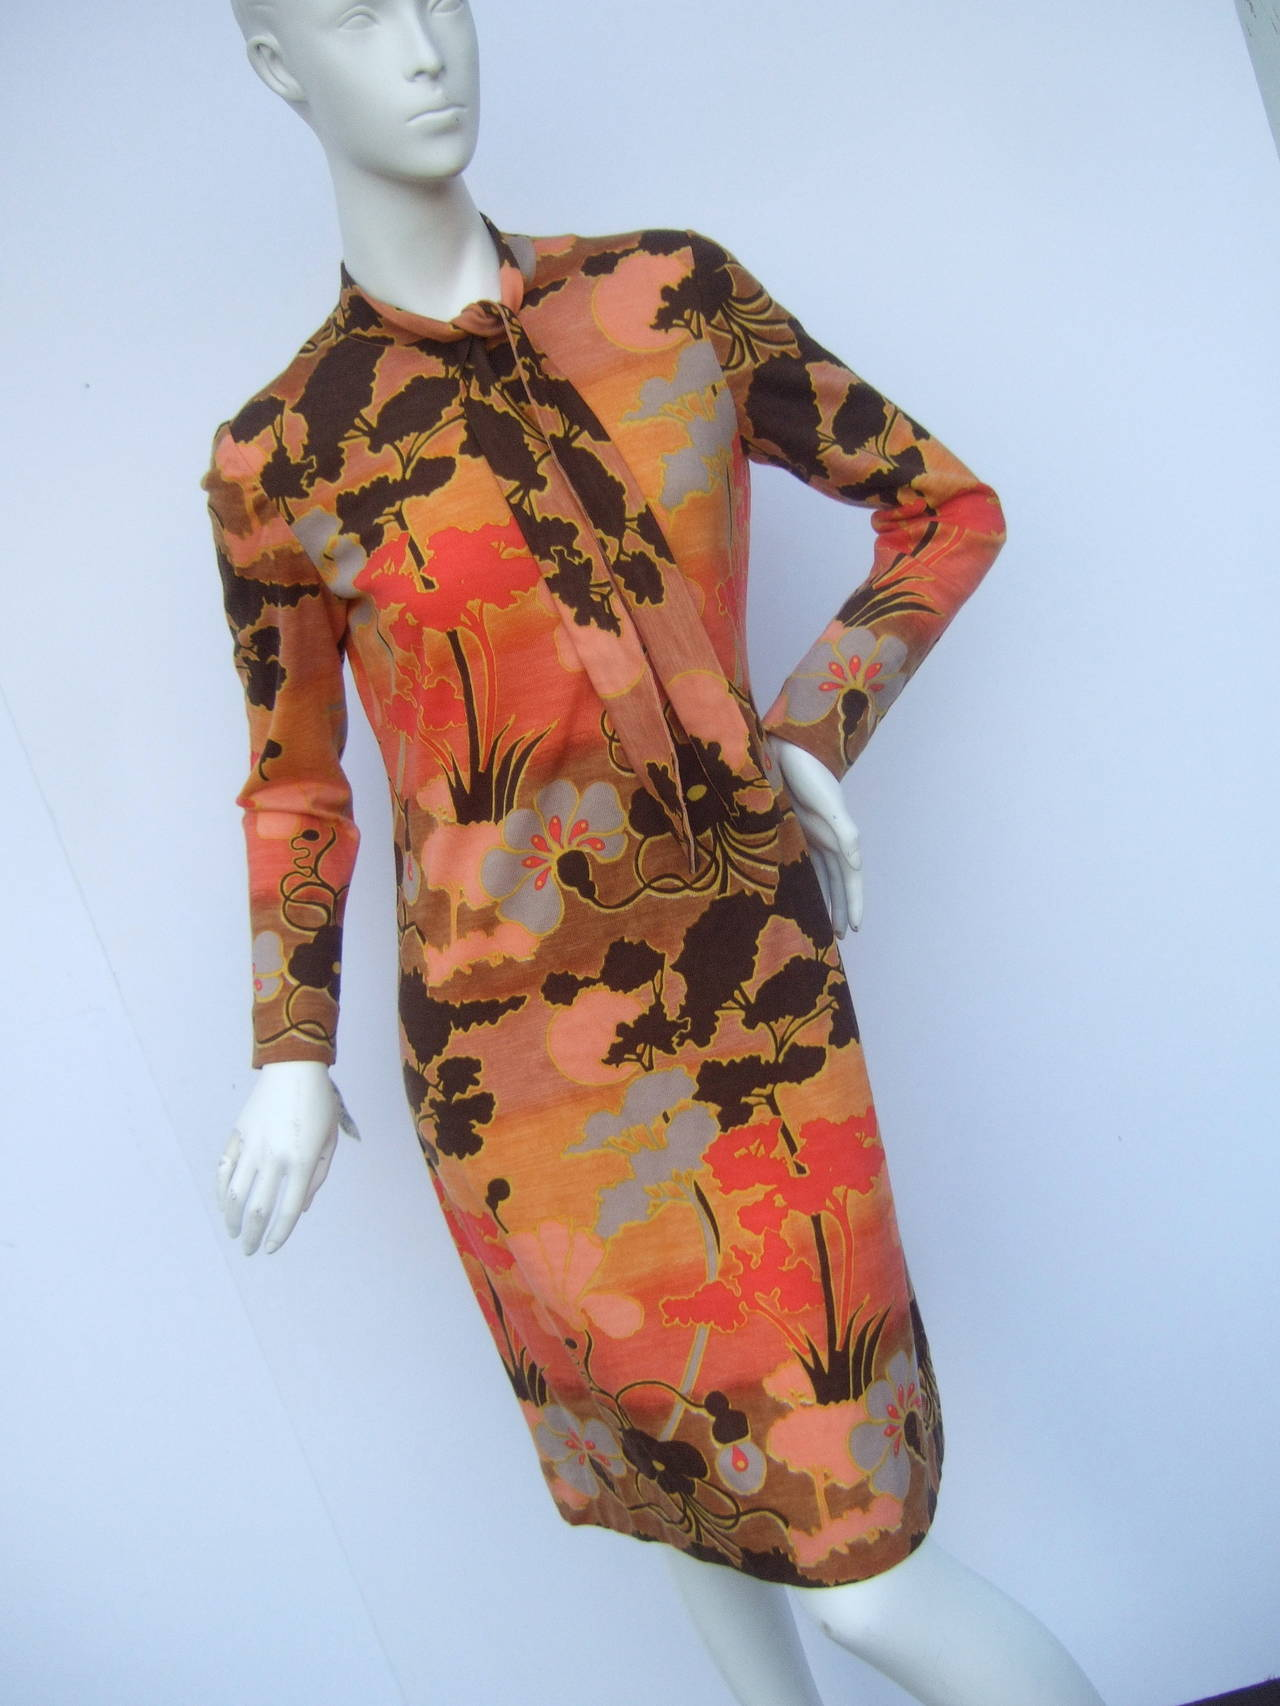 Orange Italian Floral Print Merino Wool Knit Dress c 1970s For Sale